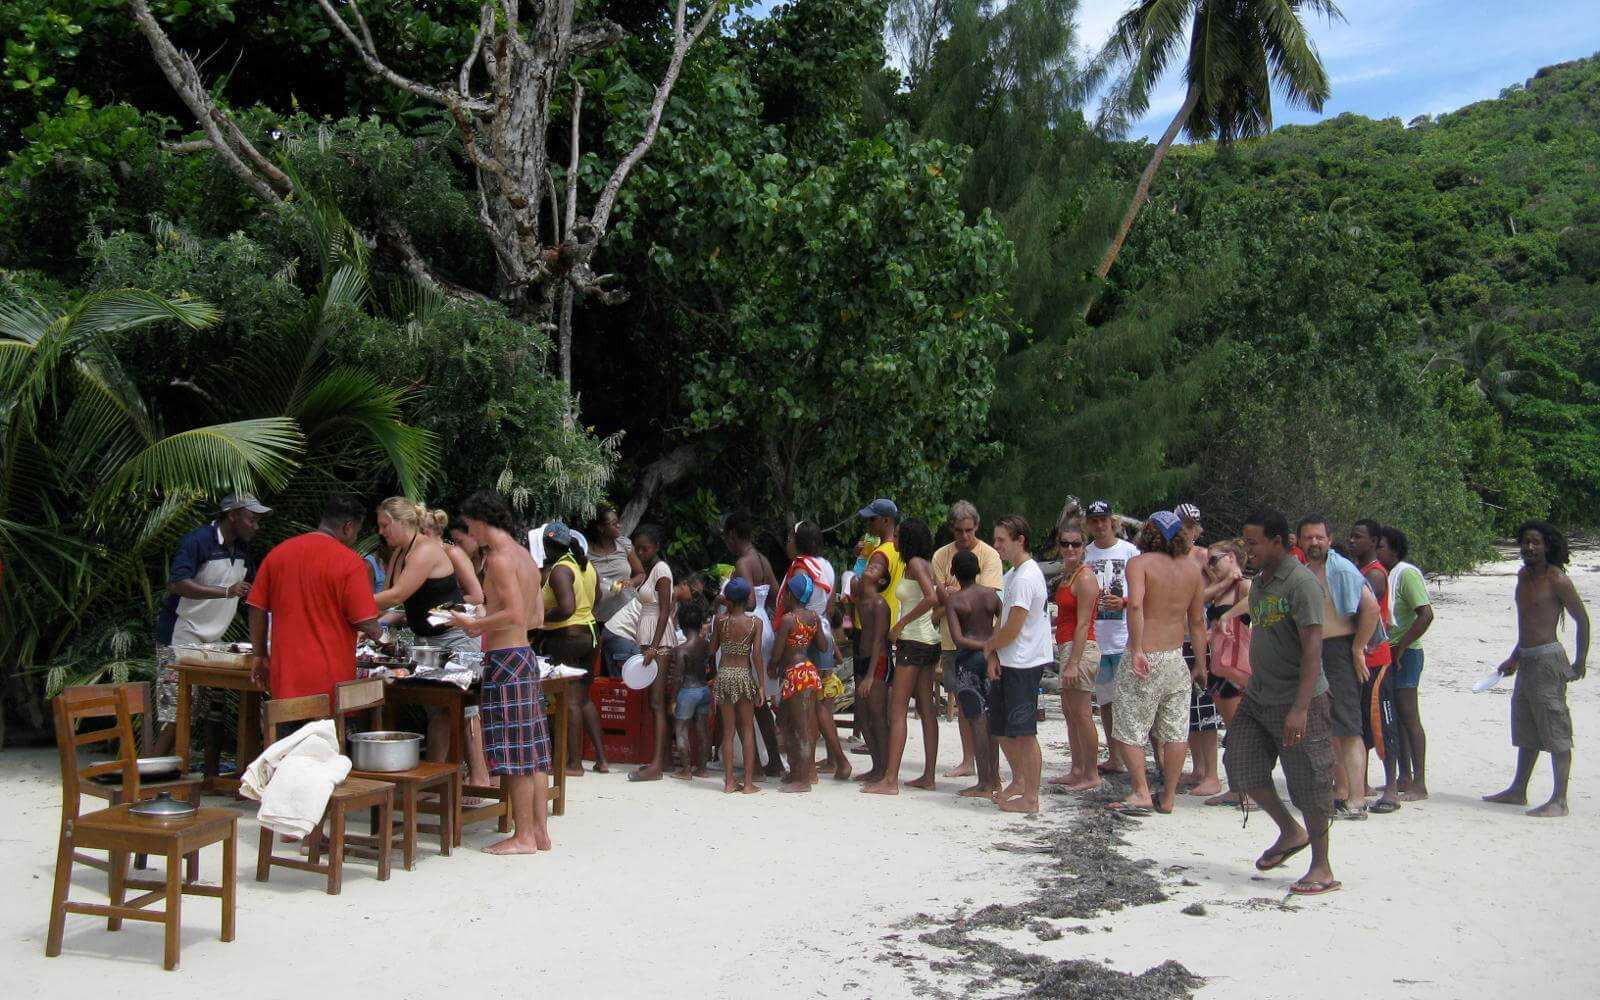 Menschen am Strand des Meeresschutzprojekts